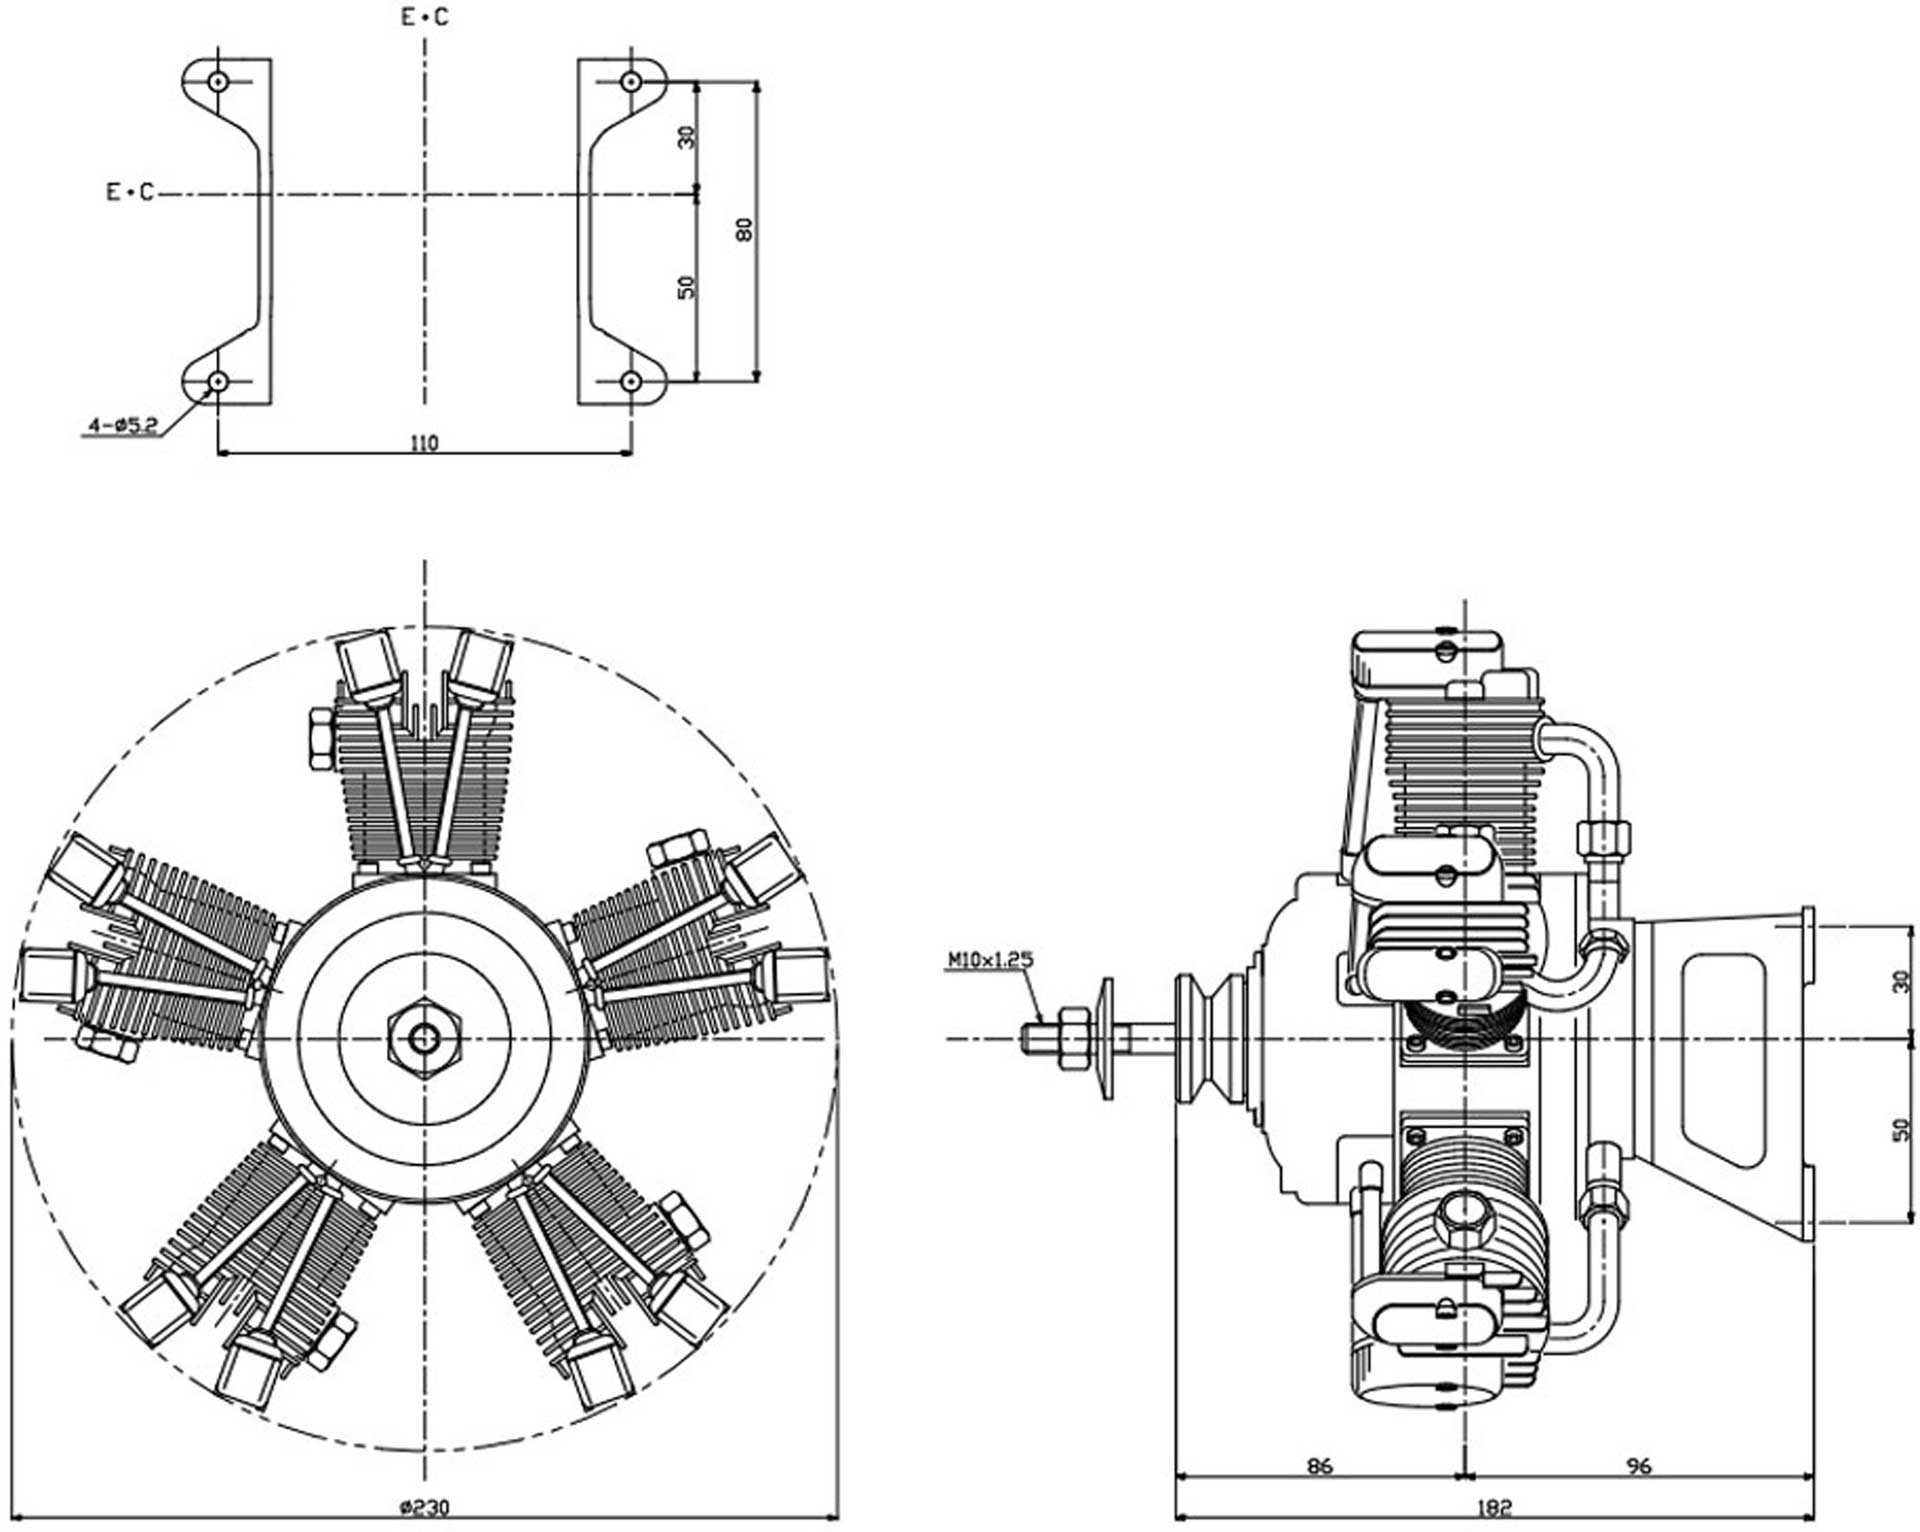 SAITO FG-73R5 BENZIN MOTOR 5-ZYLINDER